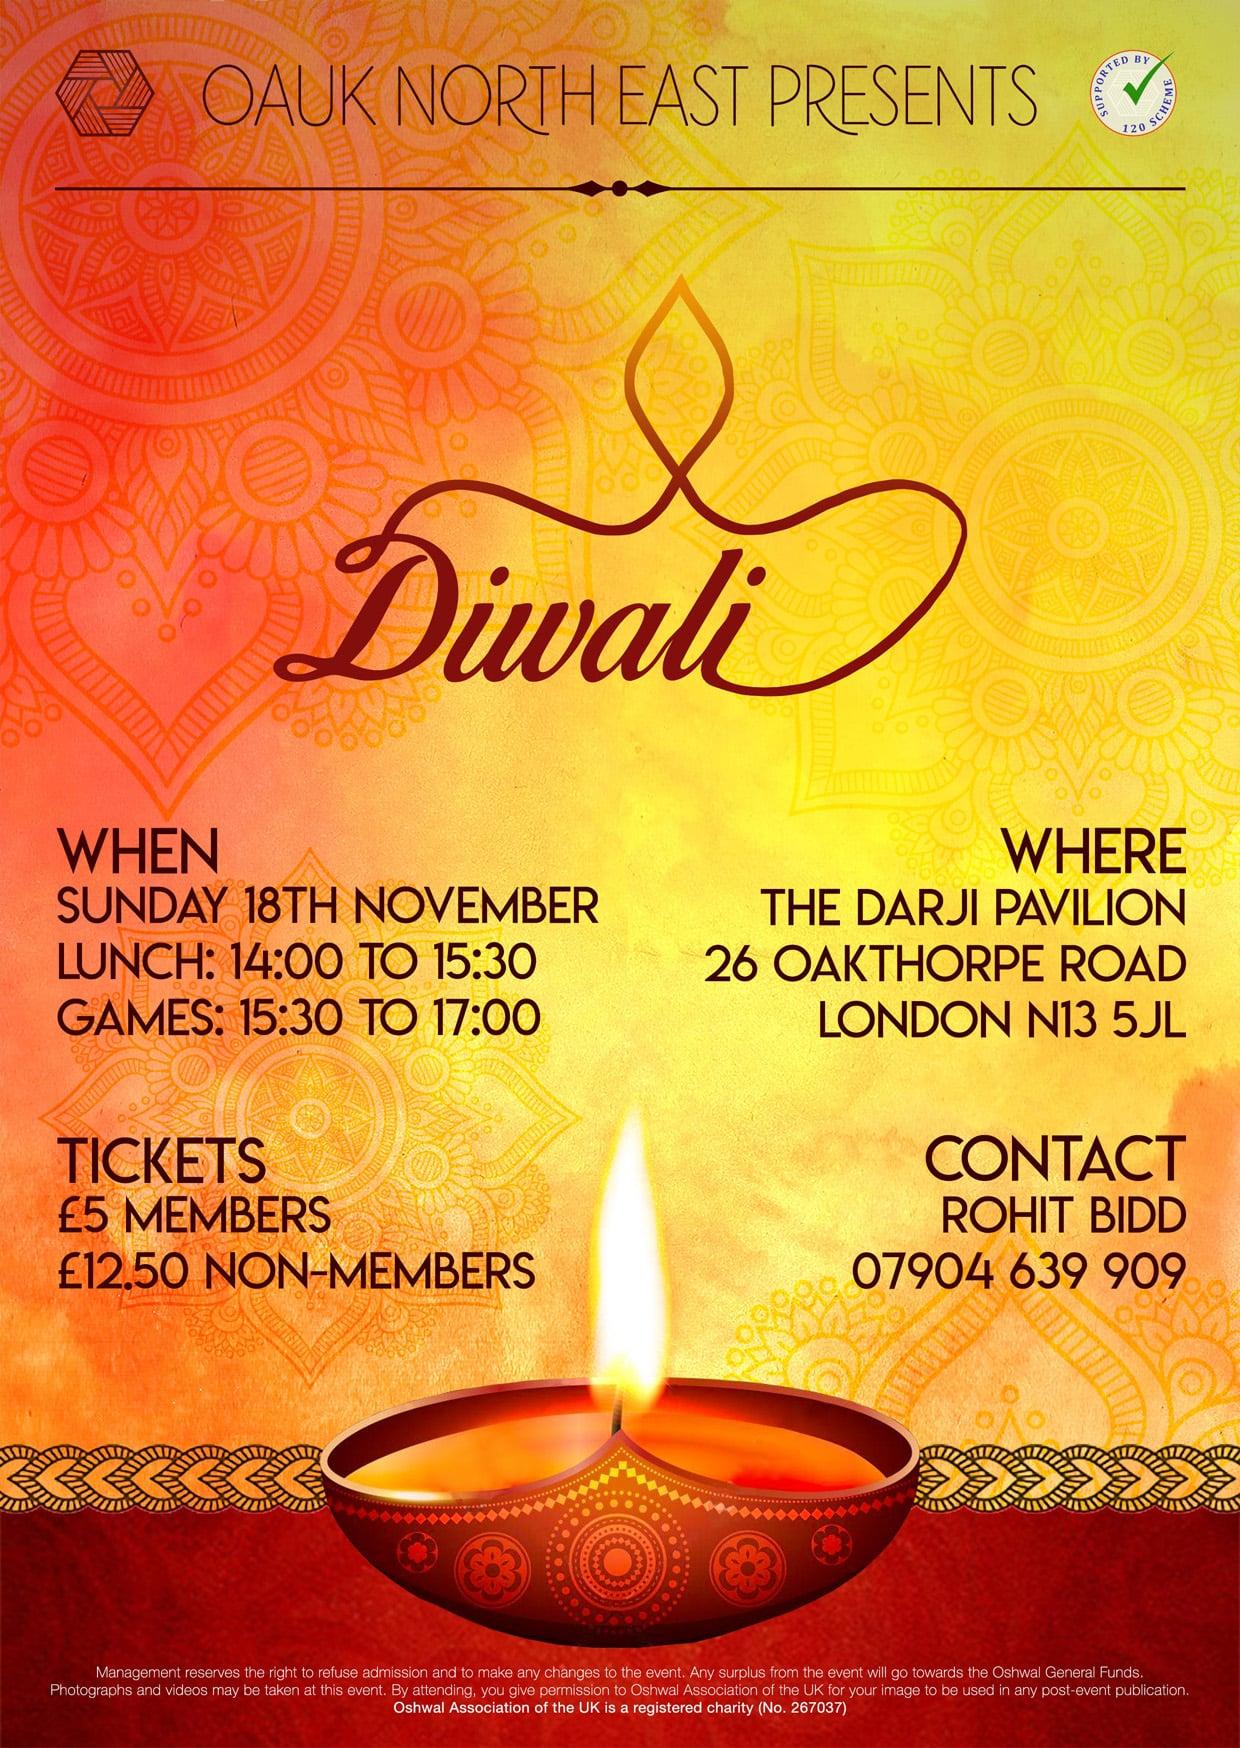 NE Diwali poster